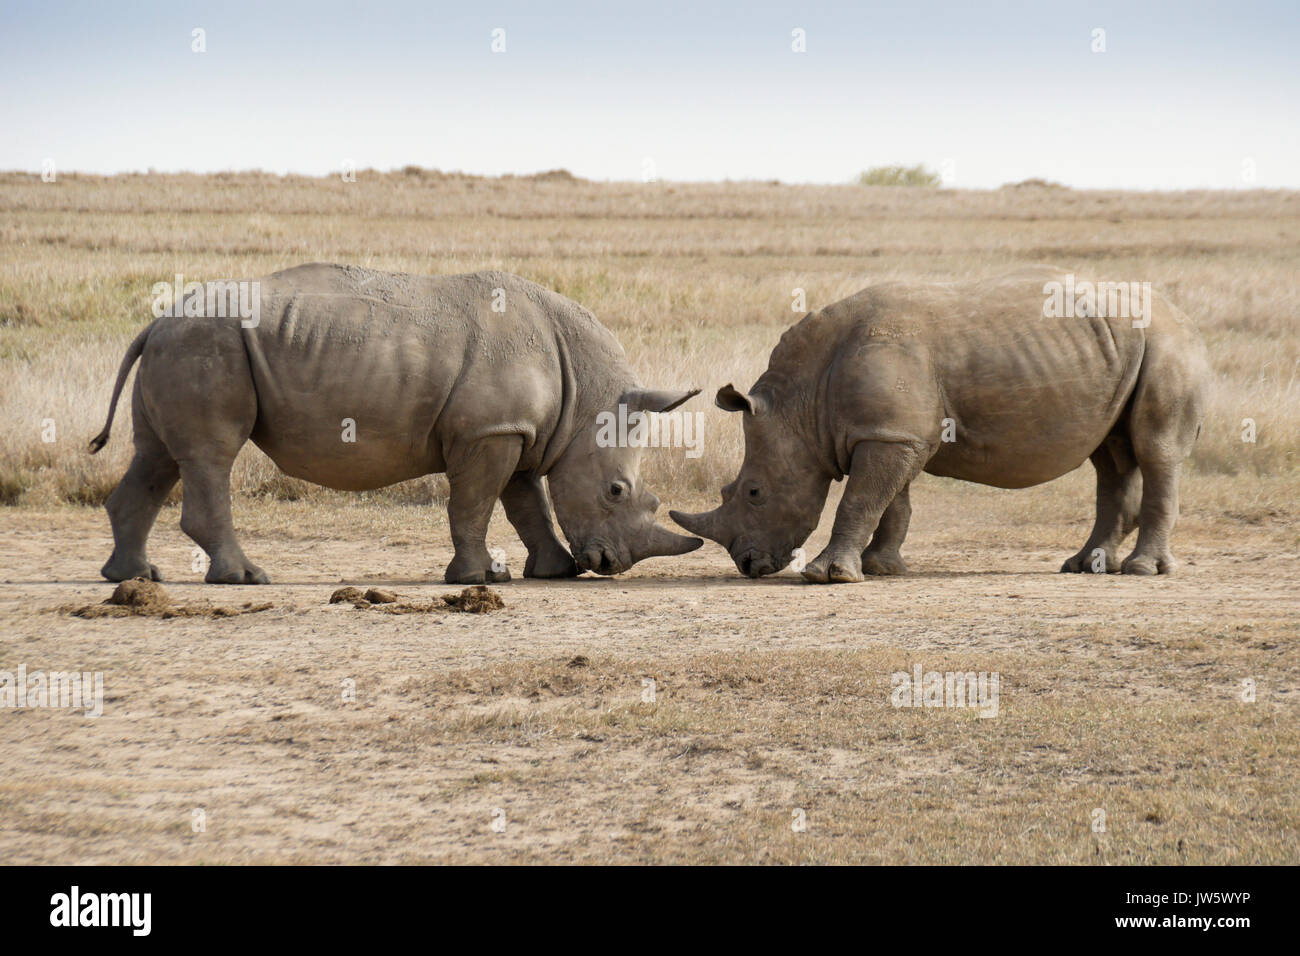 Male white rhinos mock fighting for dominance, Ol Pejeta Conservancy, Kenya - Stock Image